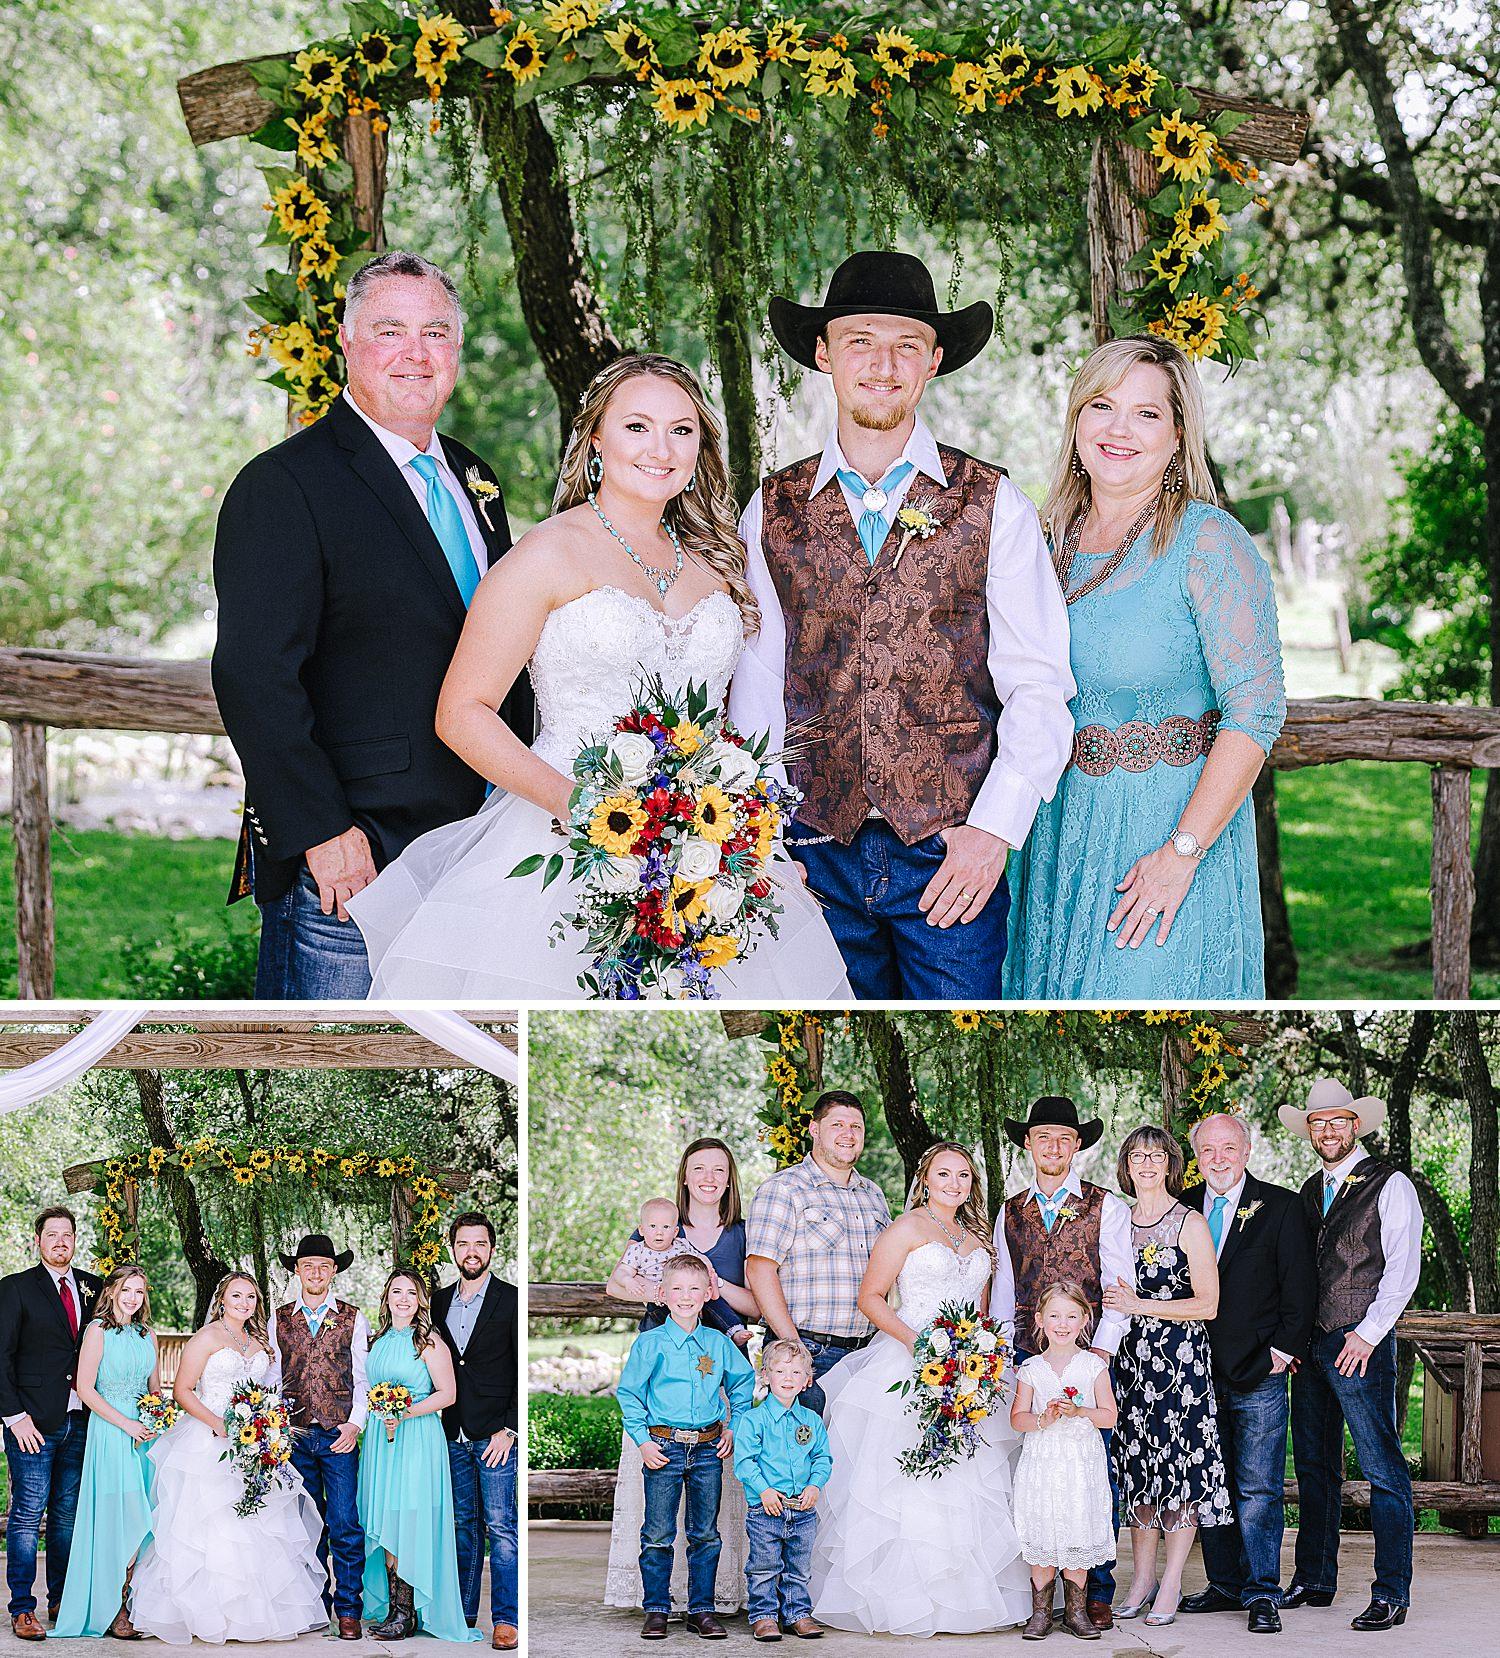 Carly-Barton-Photography-Old-Town-Texas-Rustic-Wedding-Photos-Sunflowers-Boots-Kyle-Texas_0050.jpg